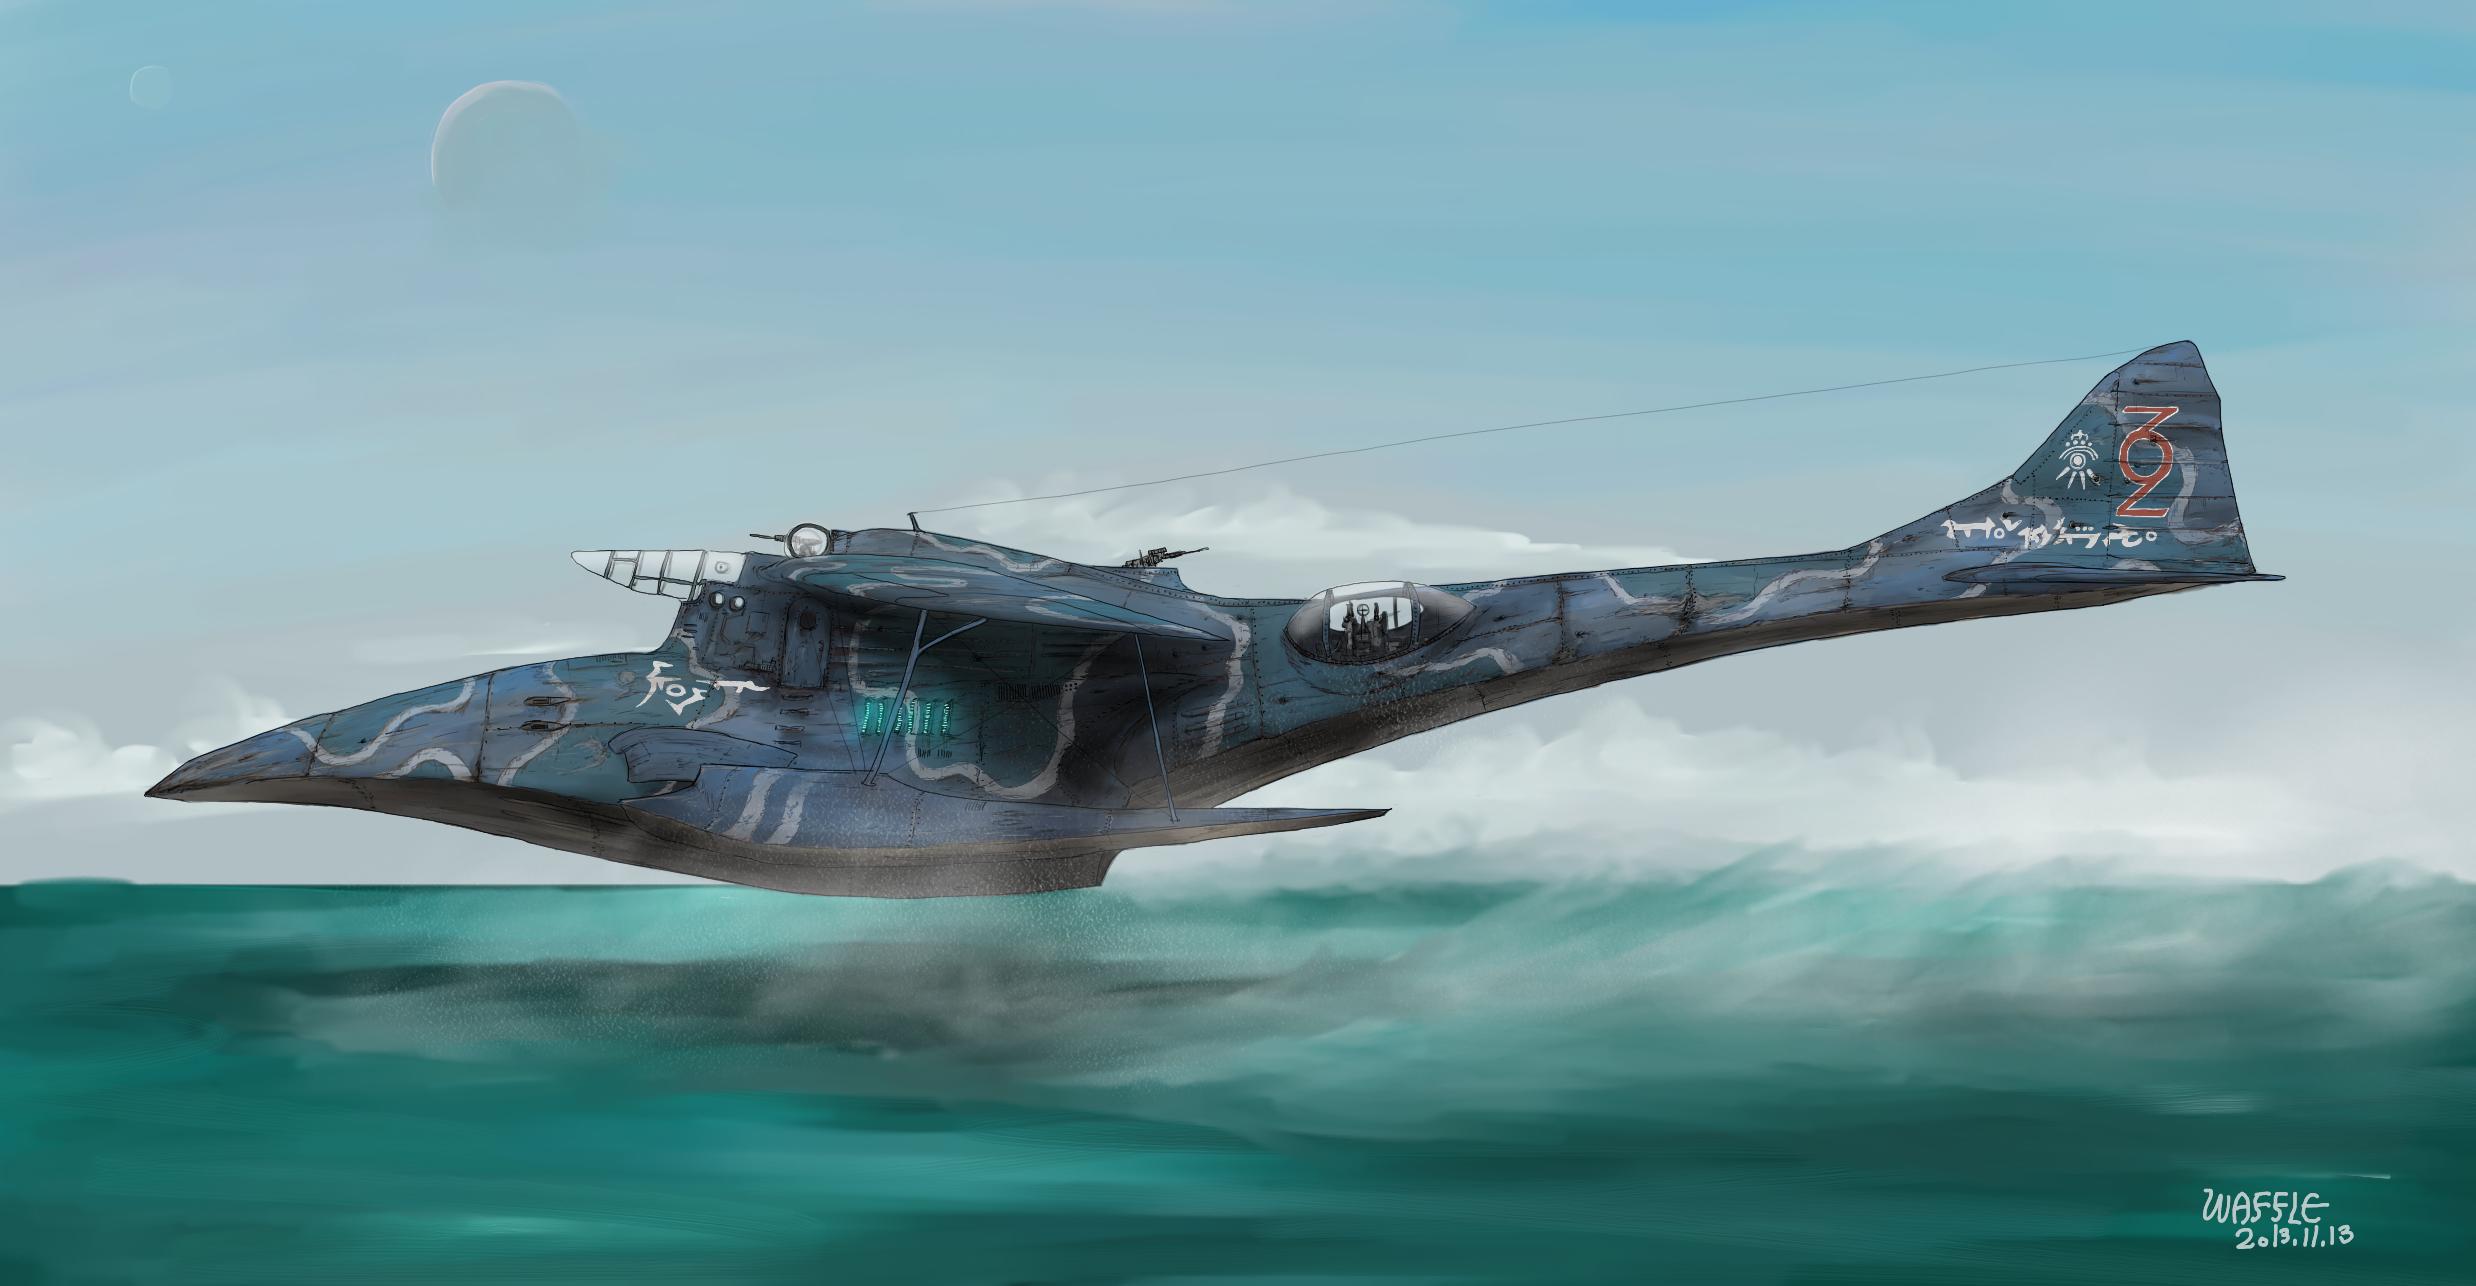 Heavy intercepter Etupirka by Waffle0708